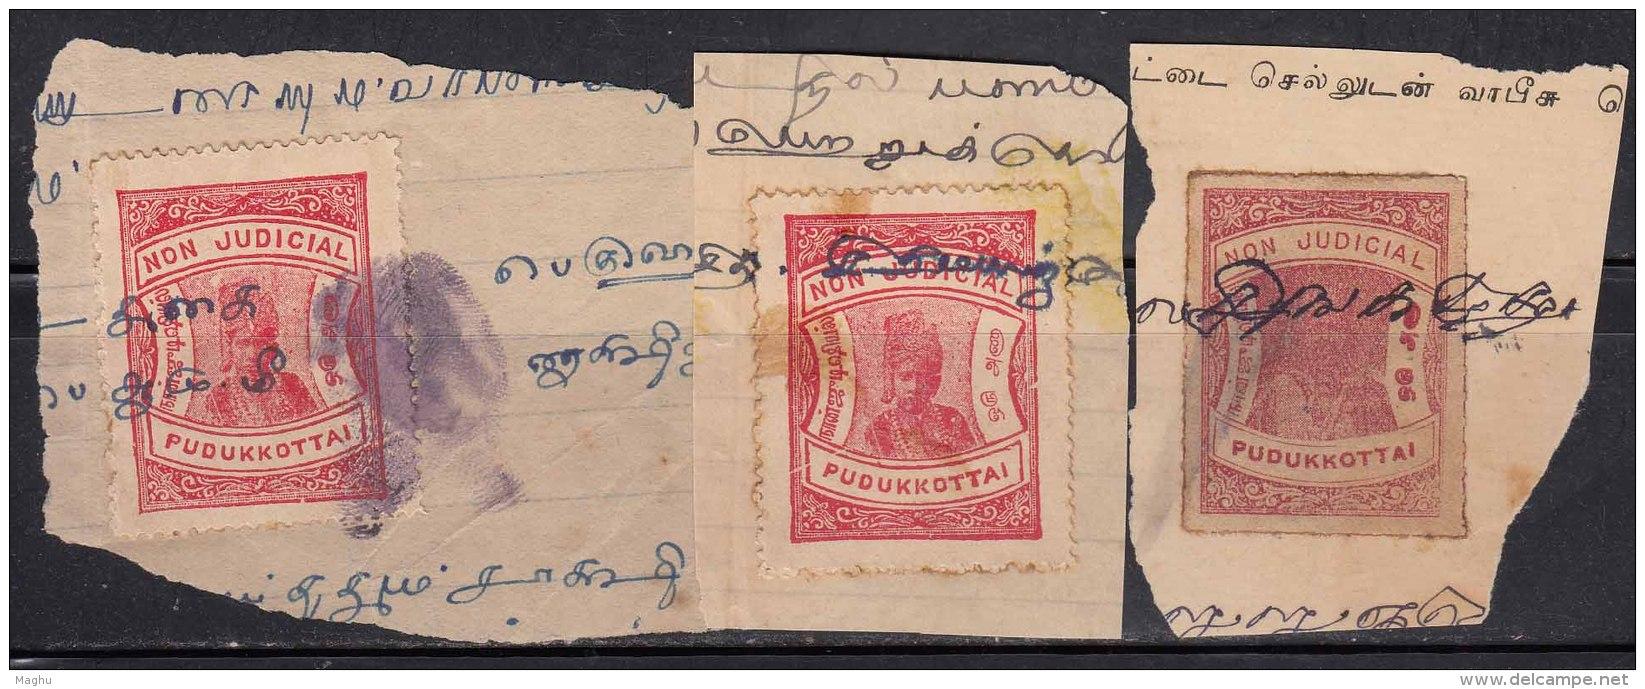 3 Diff. Shade / Colour One Anna Pudukkottai State Used, Non Judicial Fee Revenue, Fiscal, British India State - Autres